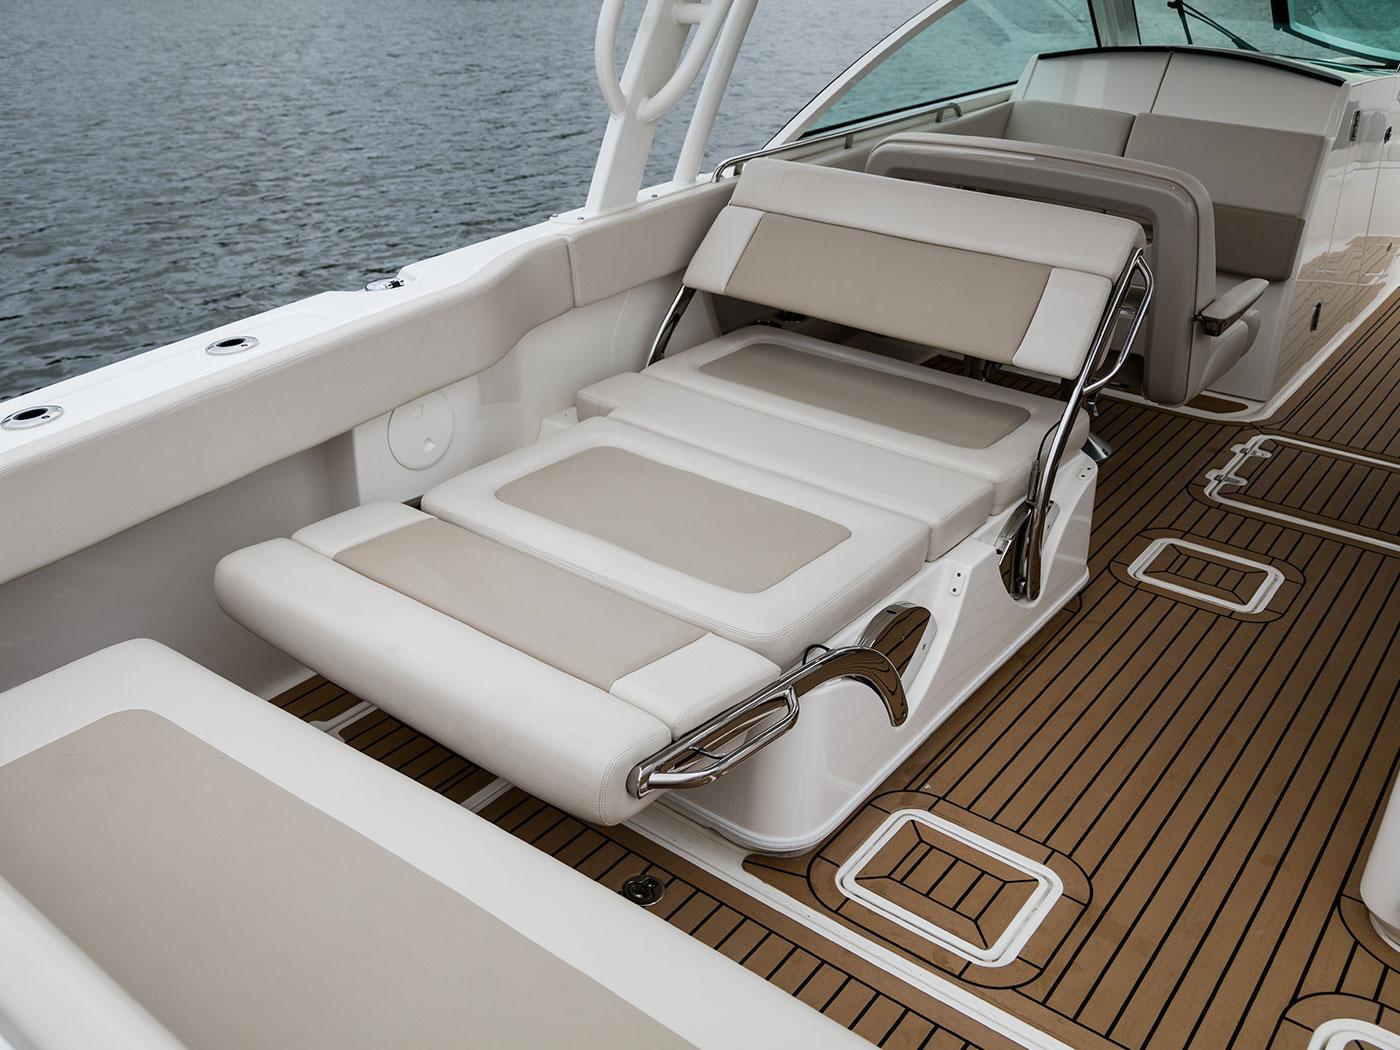 Boat Design of the Unsinkable Legend | Boston Whaler